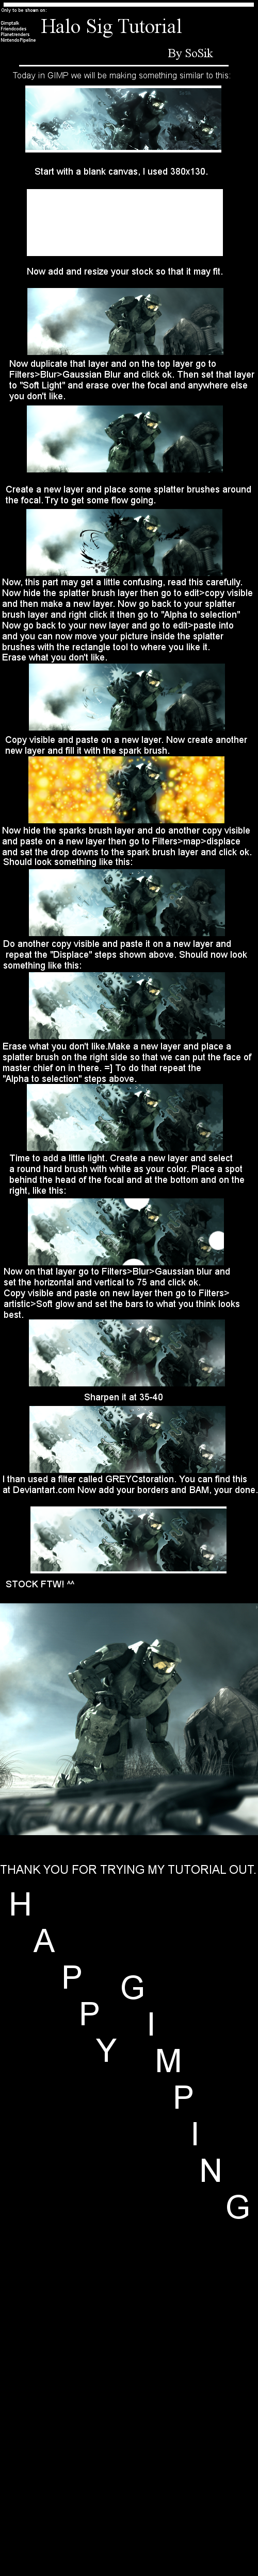 SoSik's Halo Tutorial by So-Sik